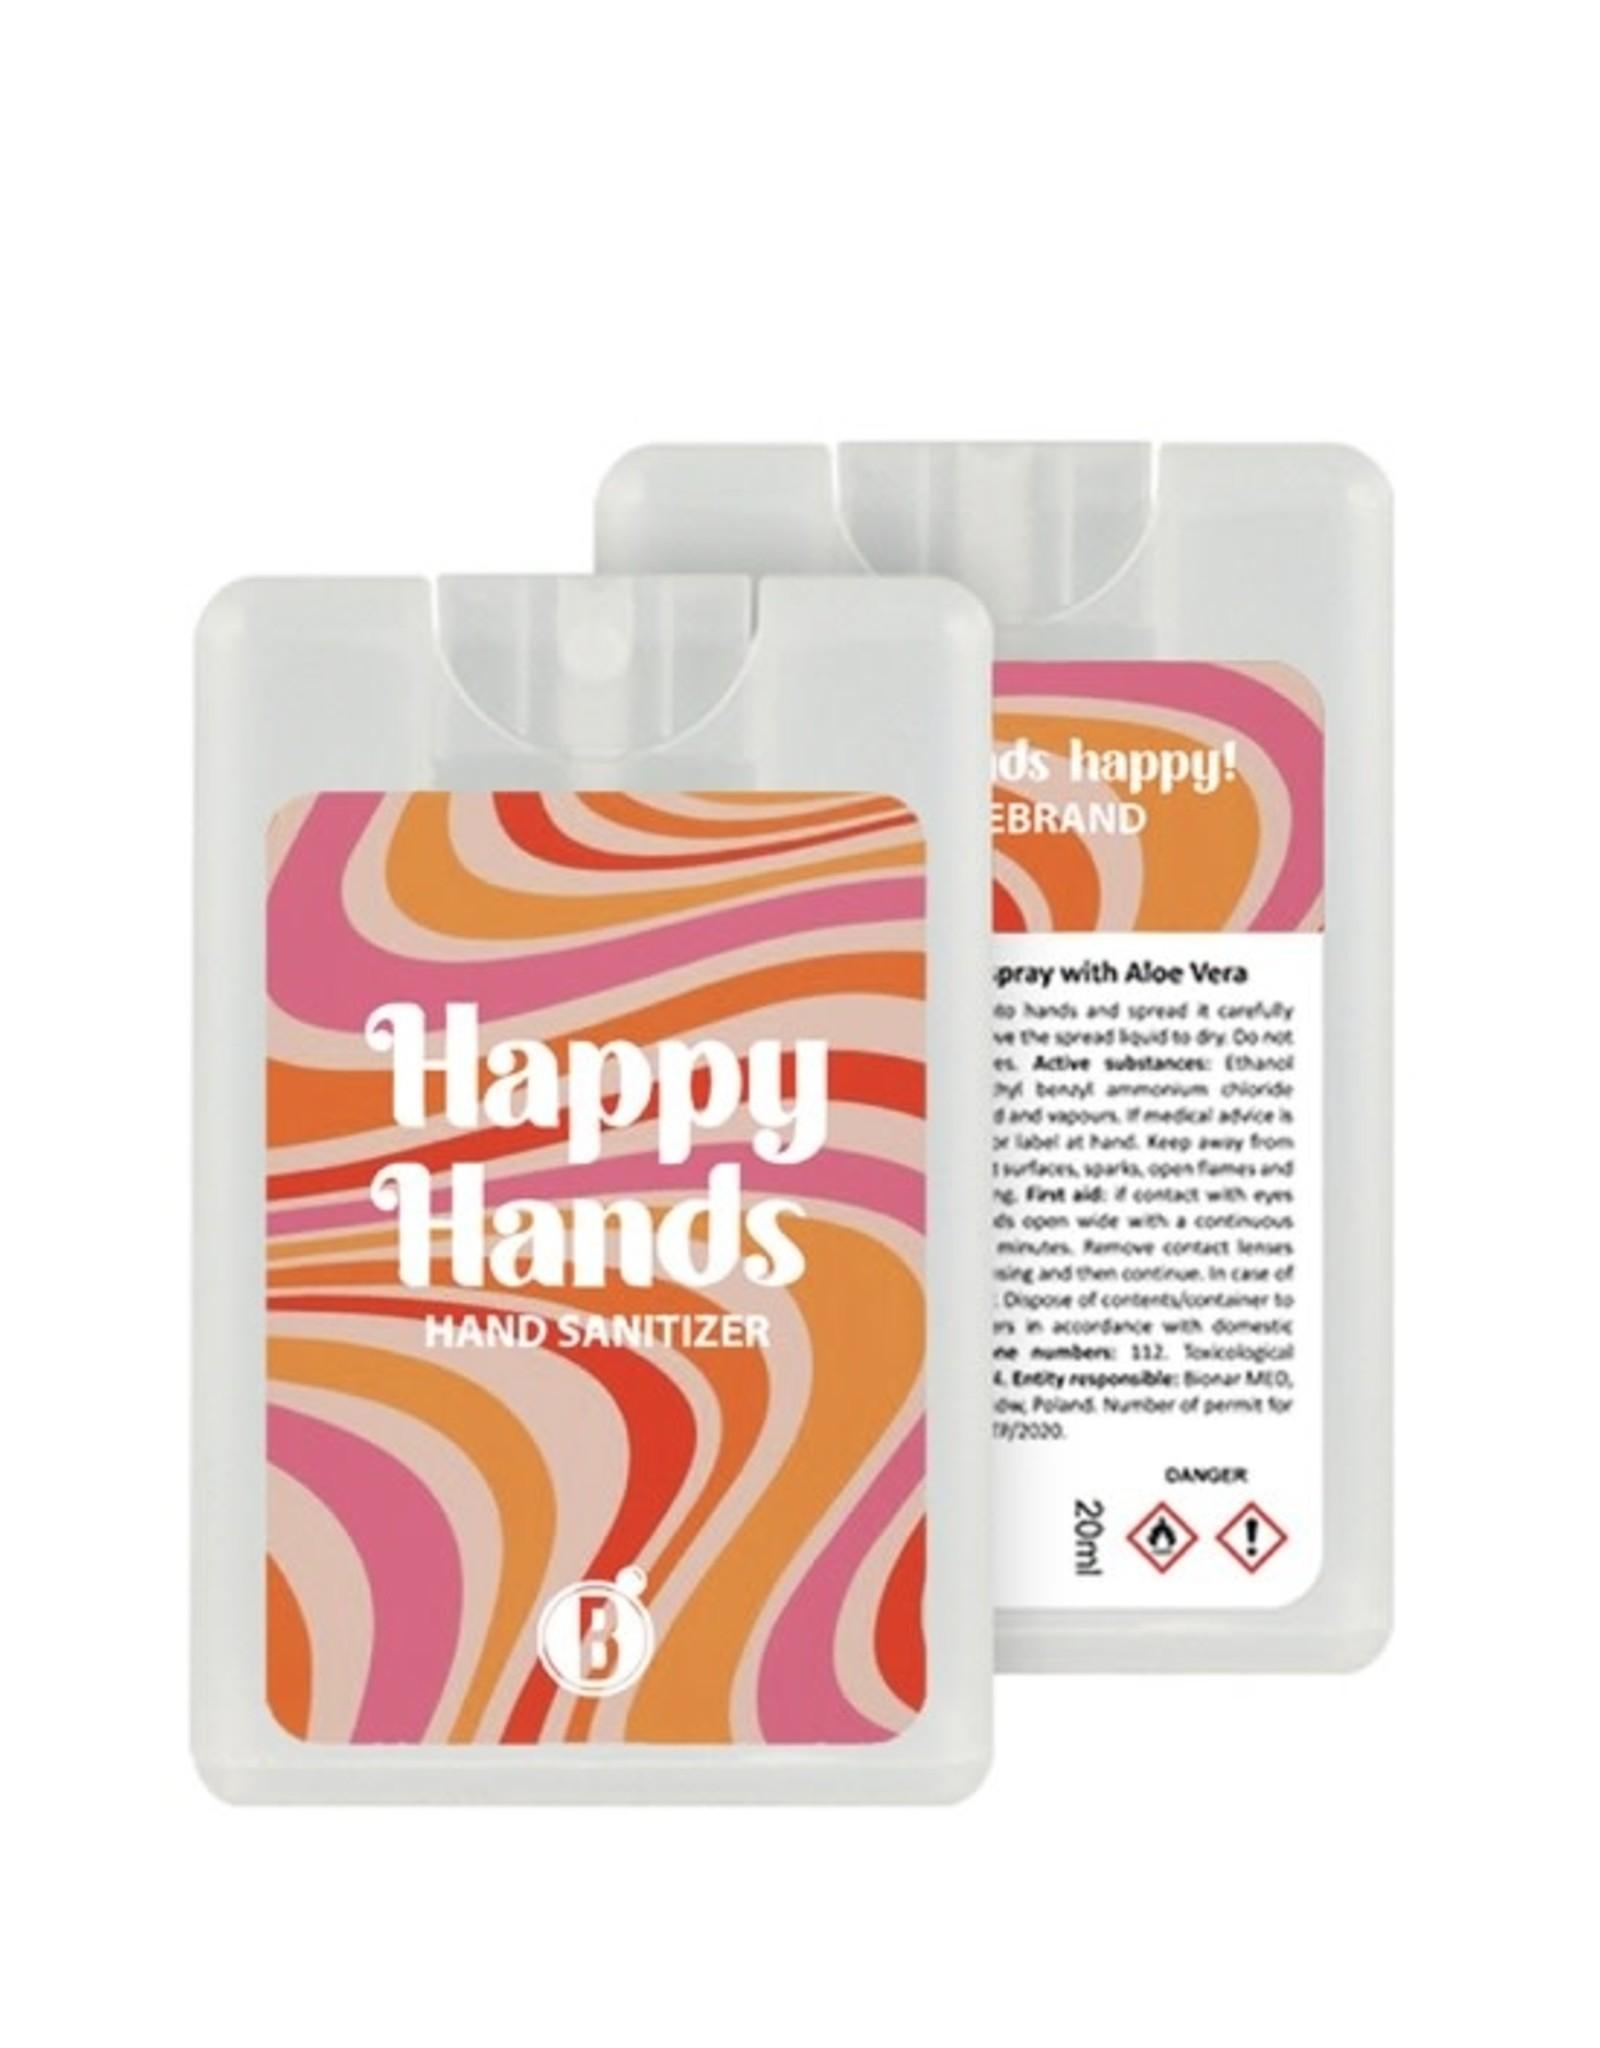 Bubbles The Brand Happy hands desinfectie spray Stripe Vibe